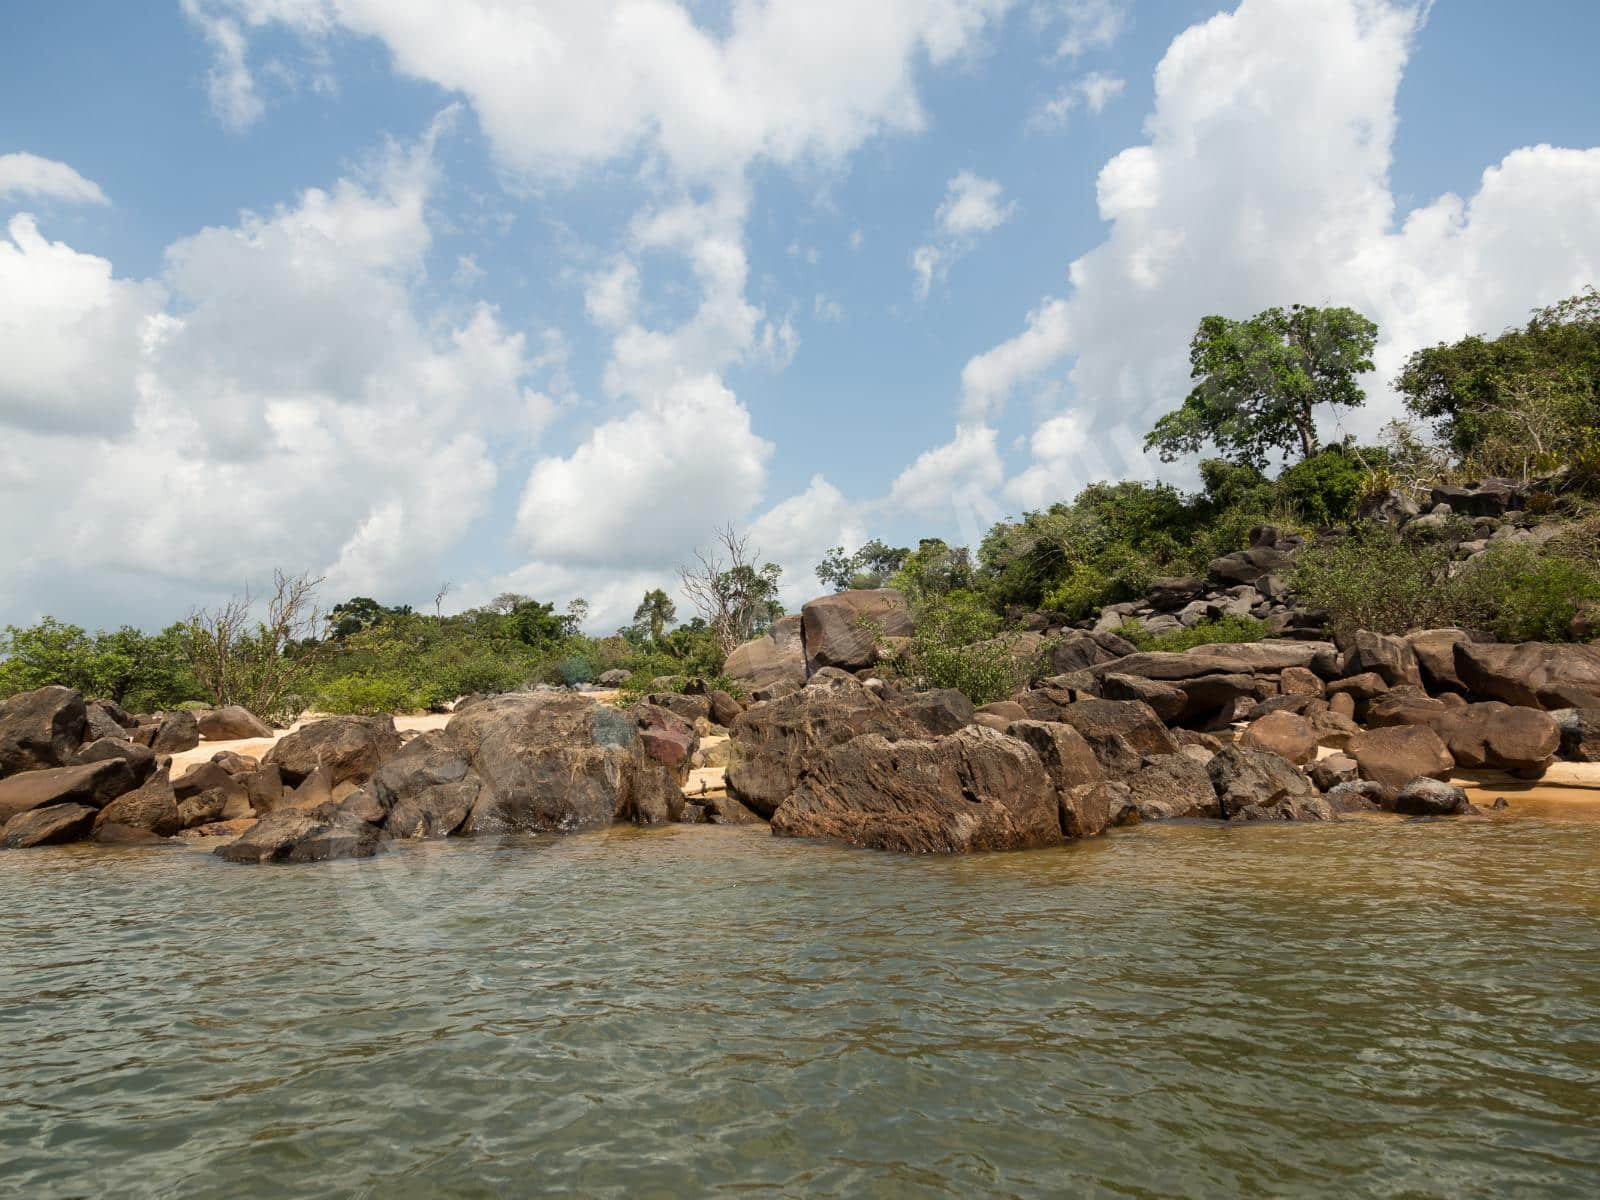 rio xingu cachoeira do tapaiunas andreas tanke 0057 8